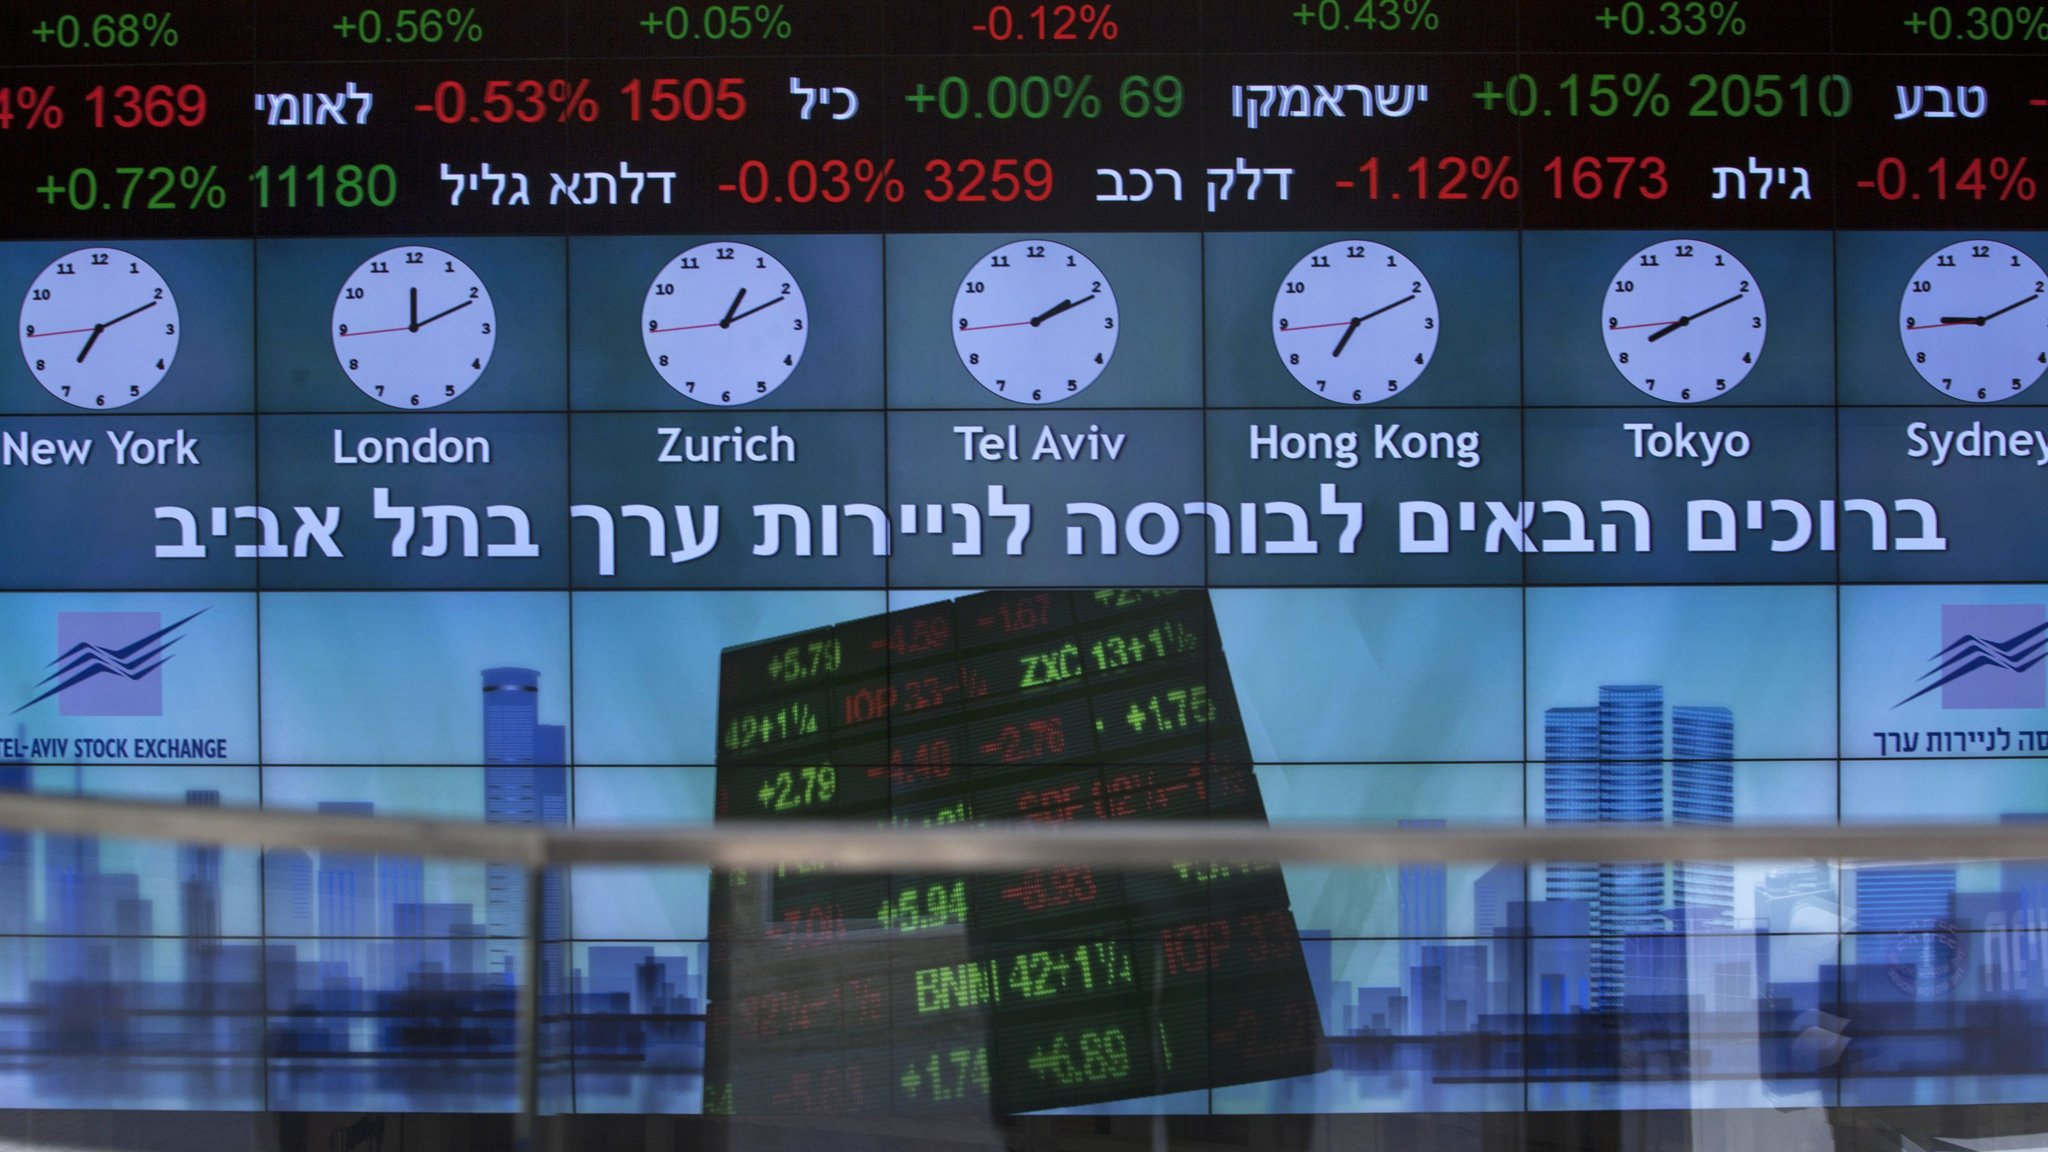 Israeli regulator becomes latest to crack down on bitcoin